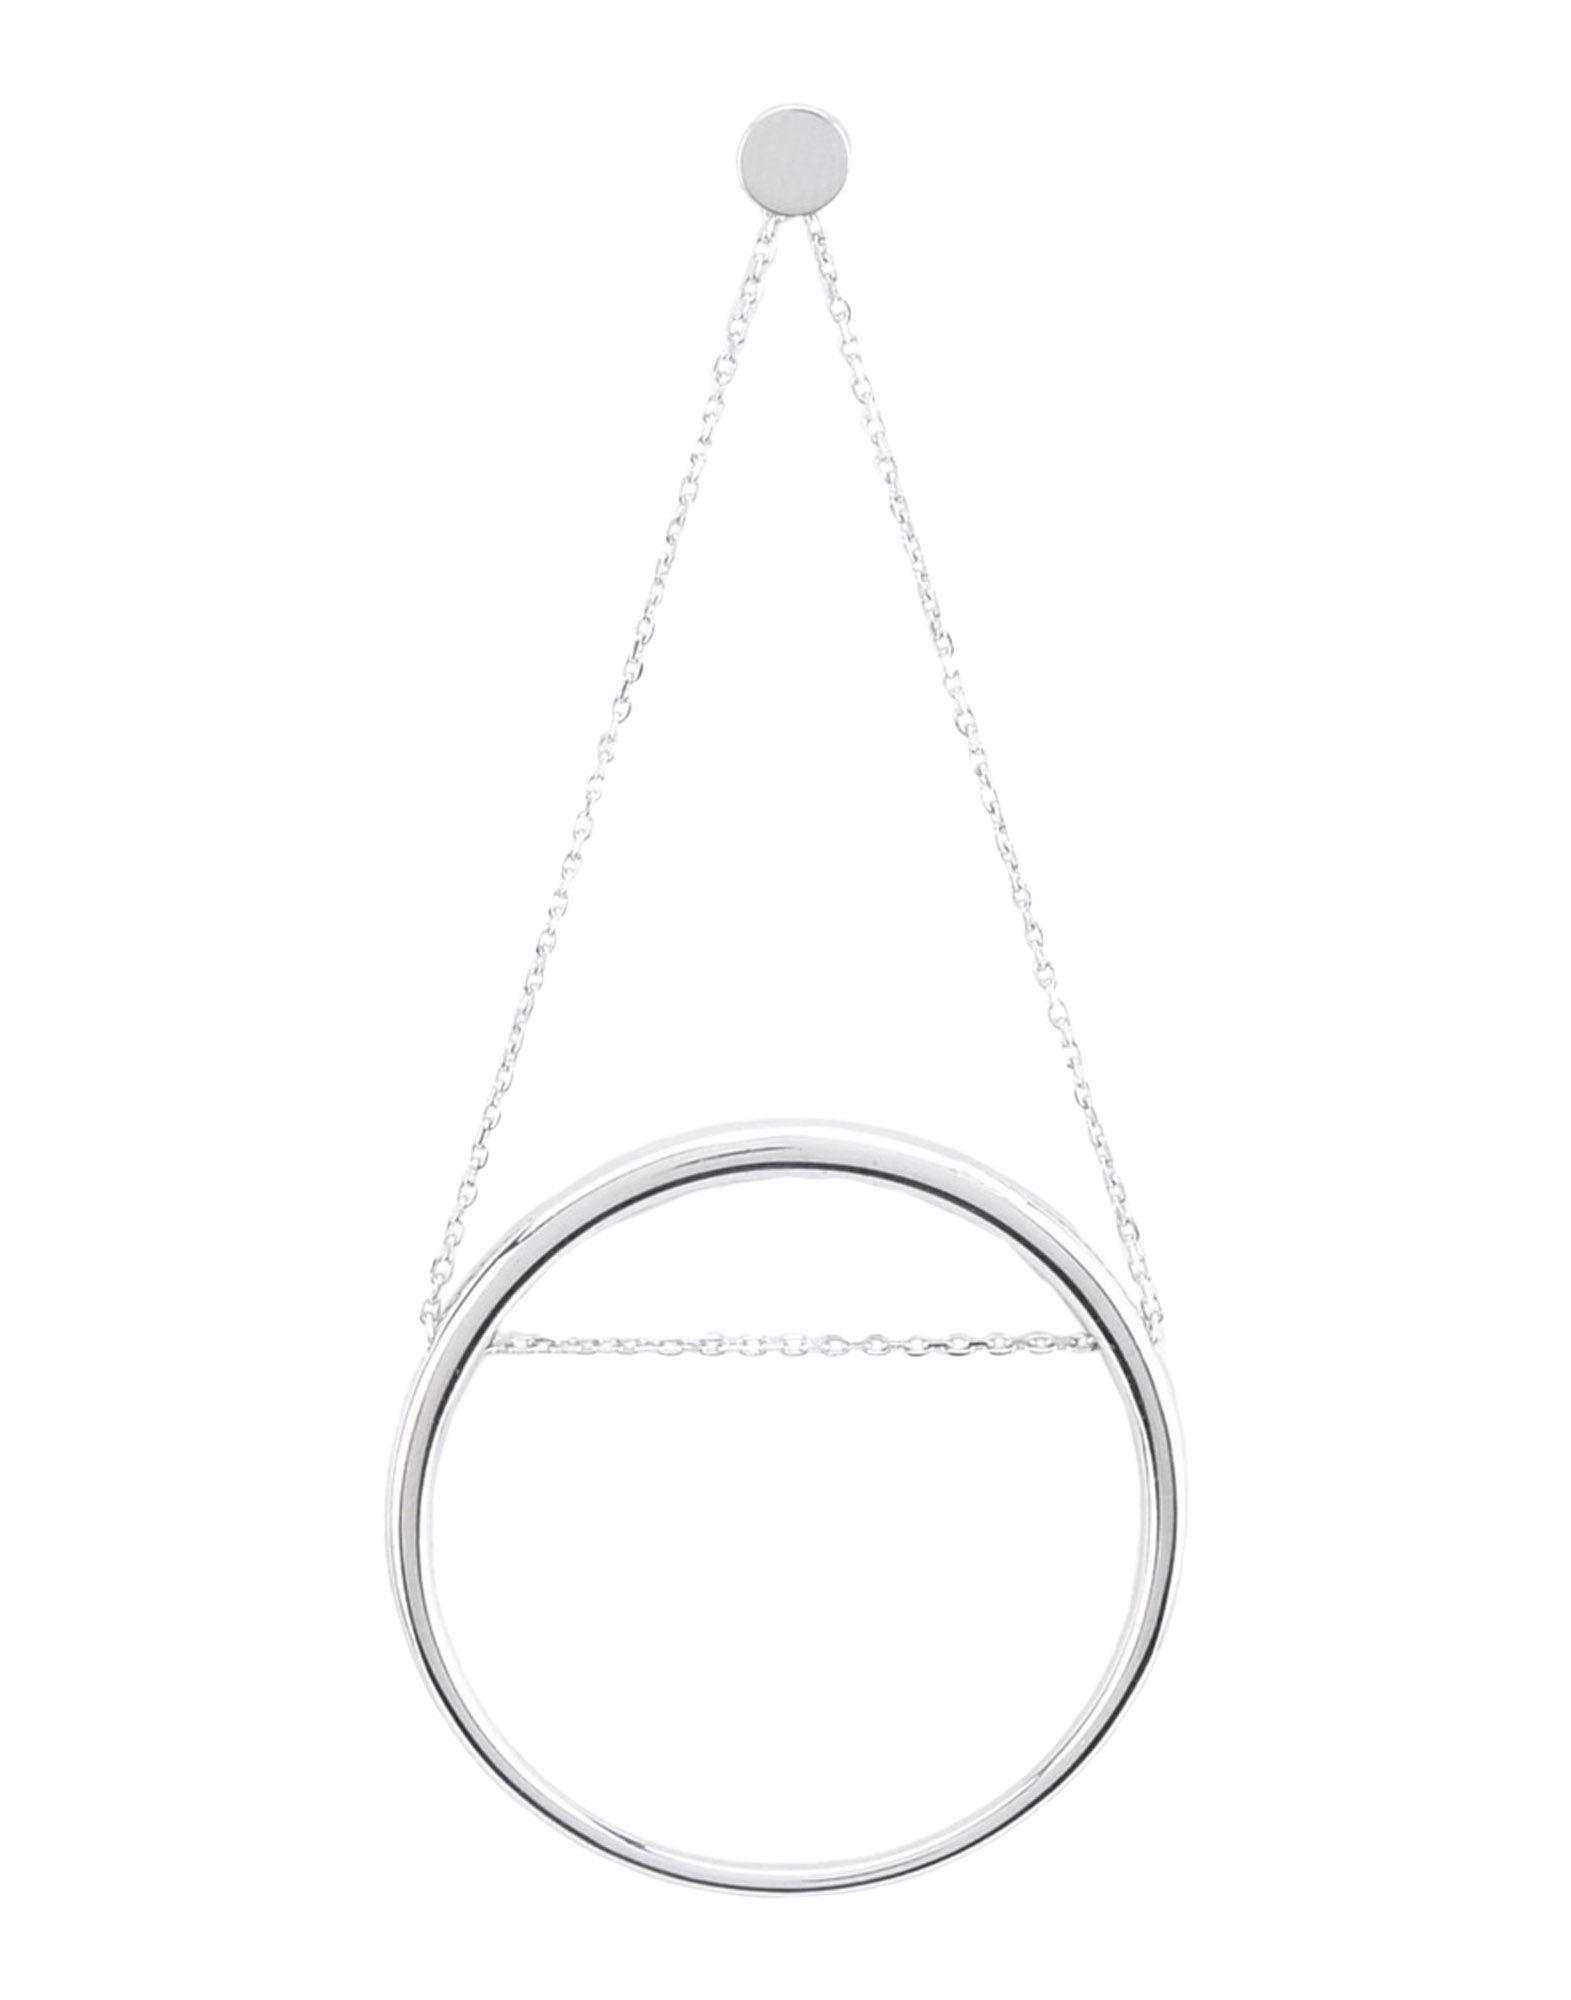 Orecchino Astrid & Miyu Spiral Swing Earrings - Donna - Acquista online su